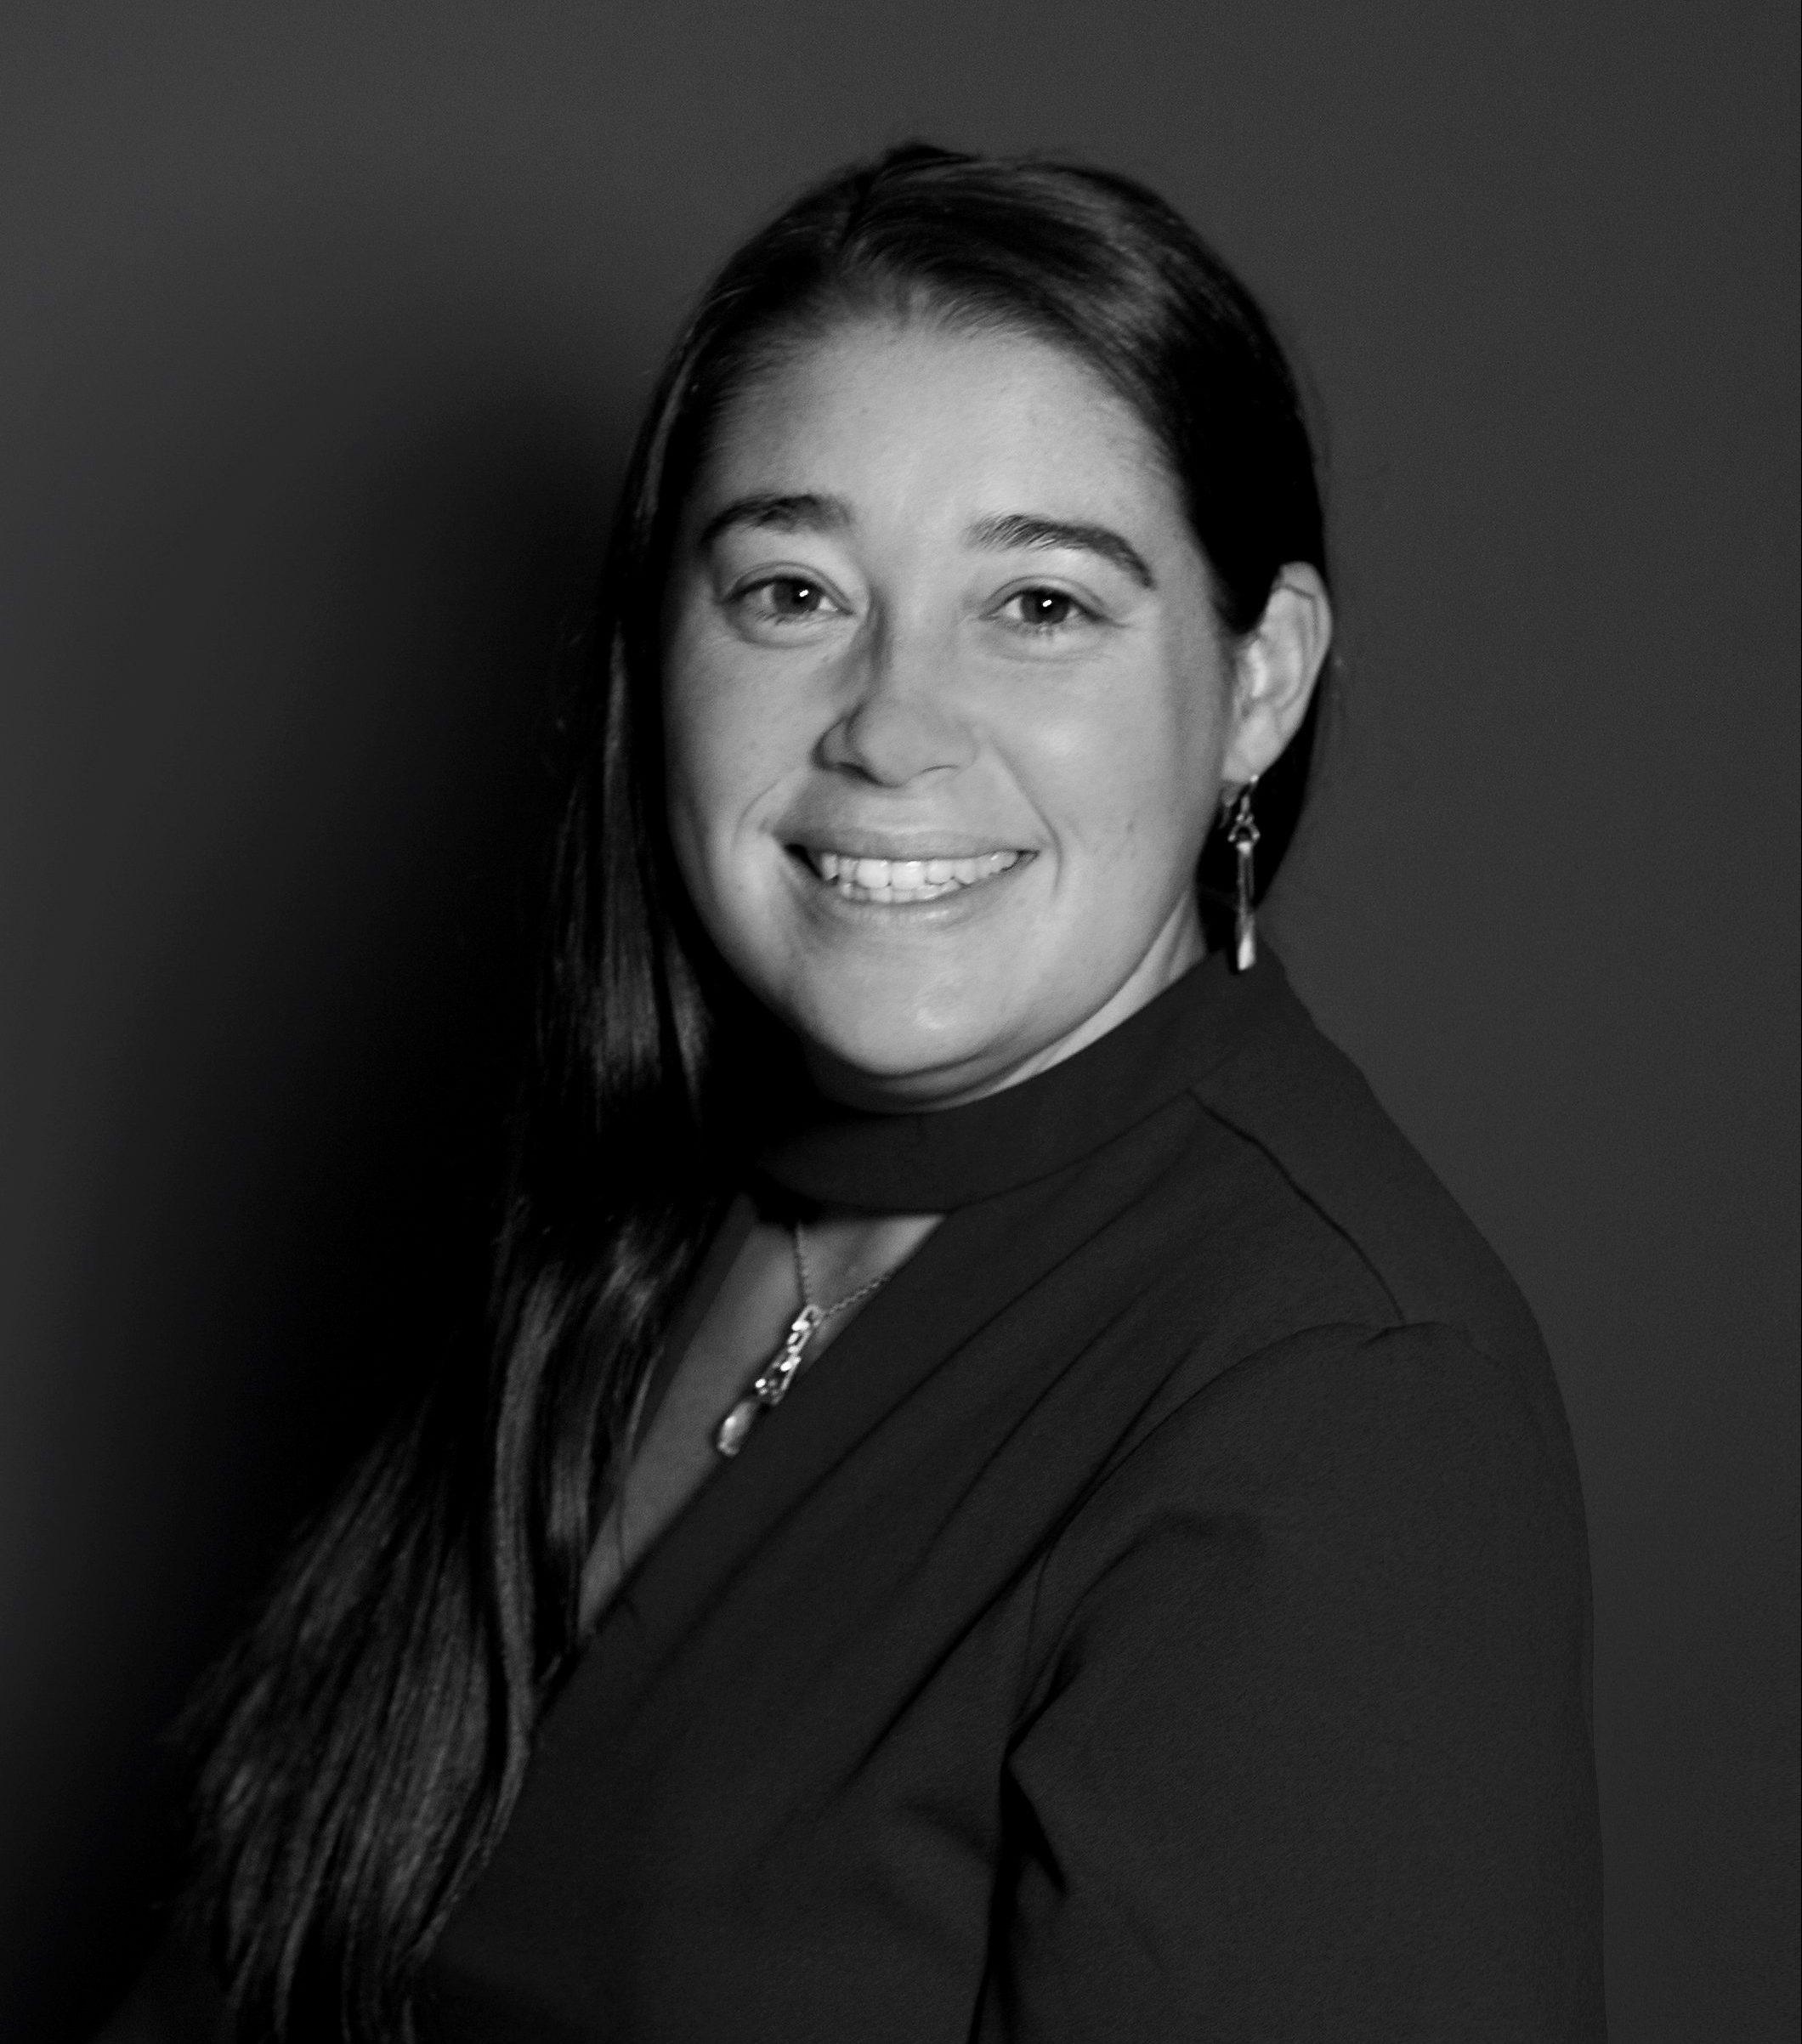 Ayla Queiroga